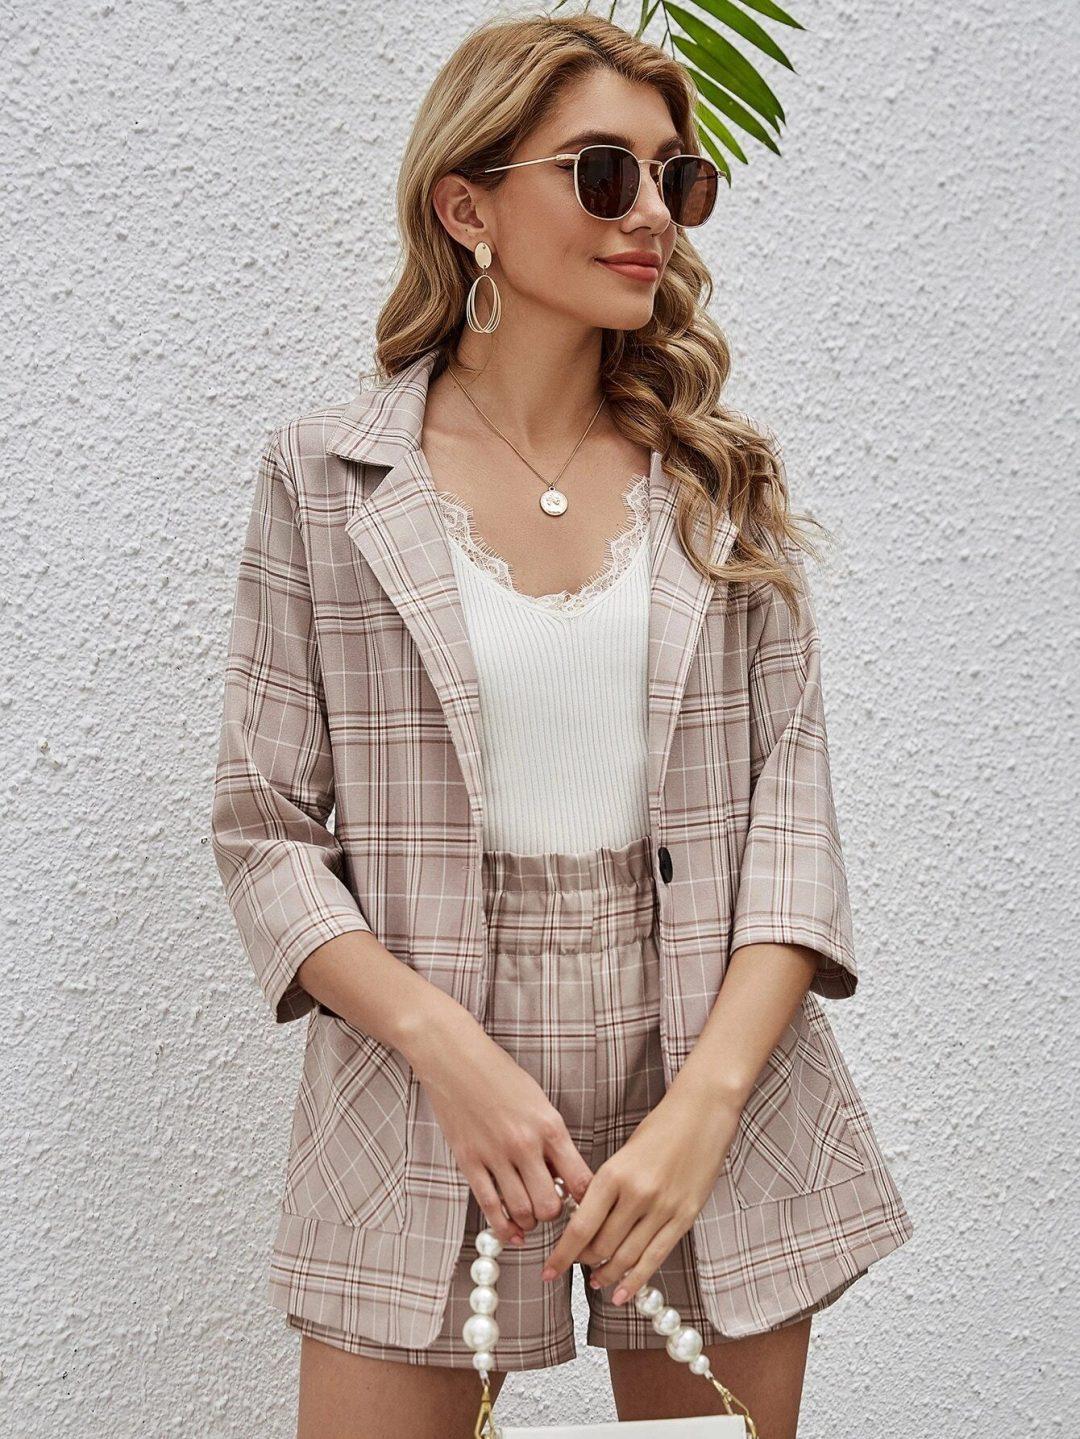 Matching plaid blazer and shorts